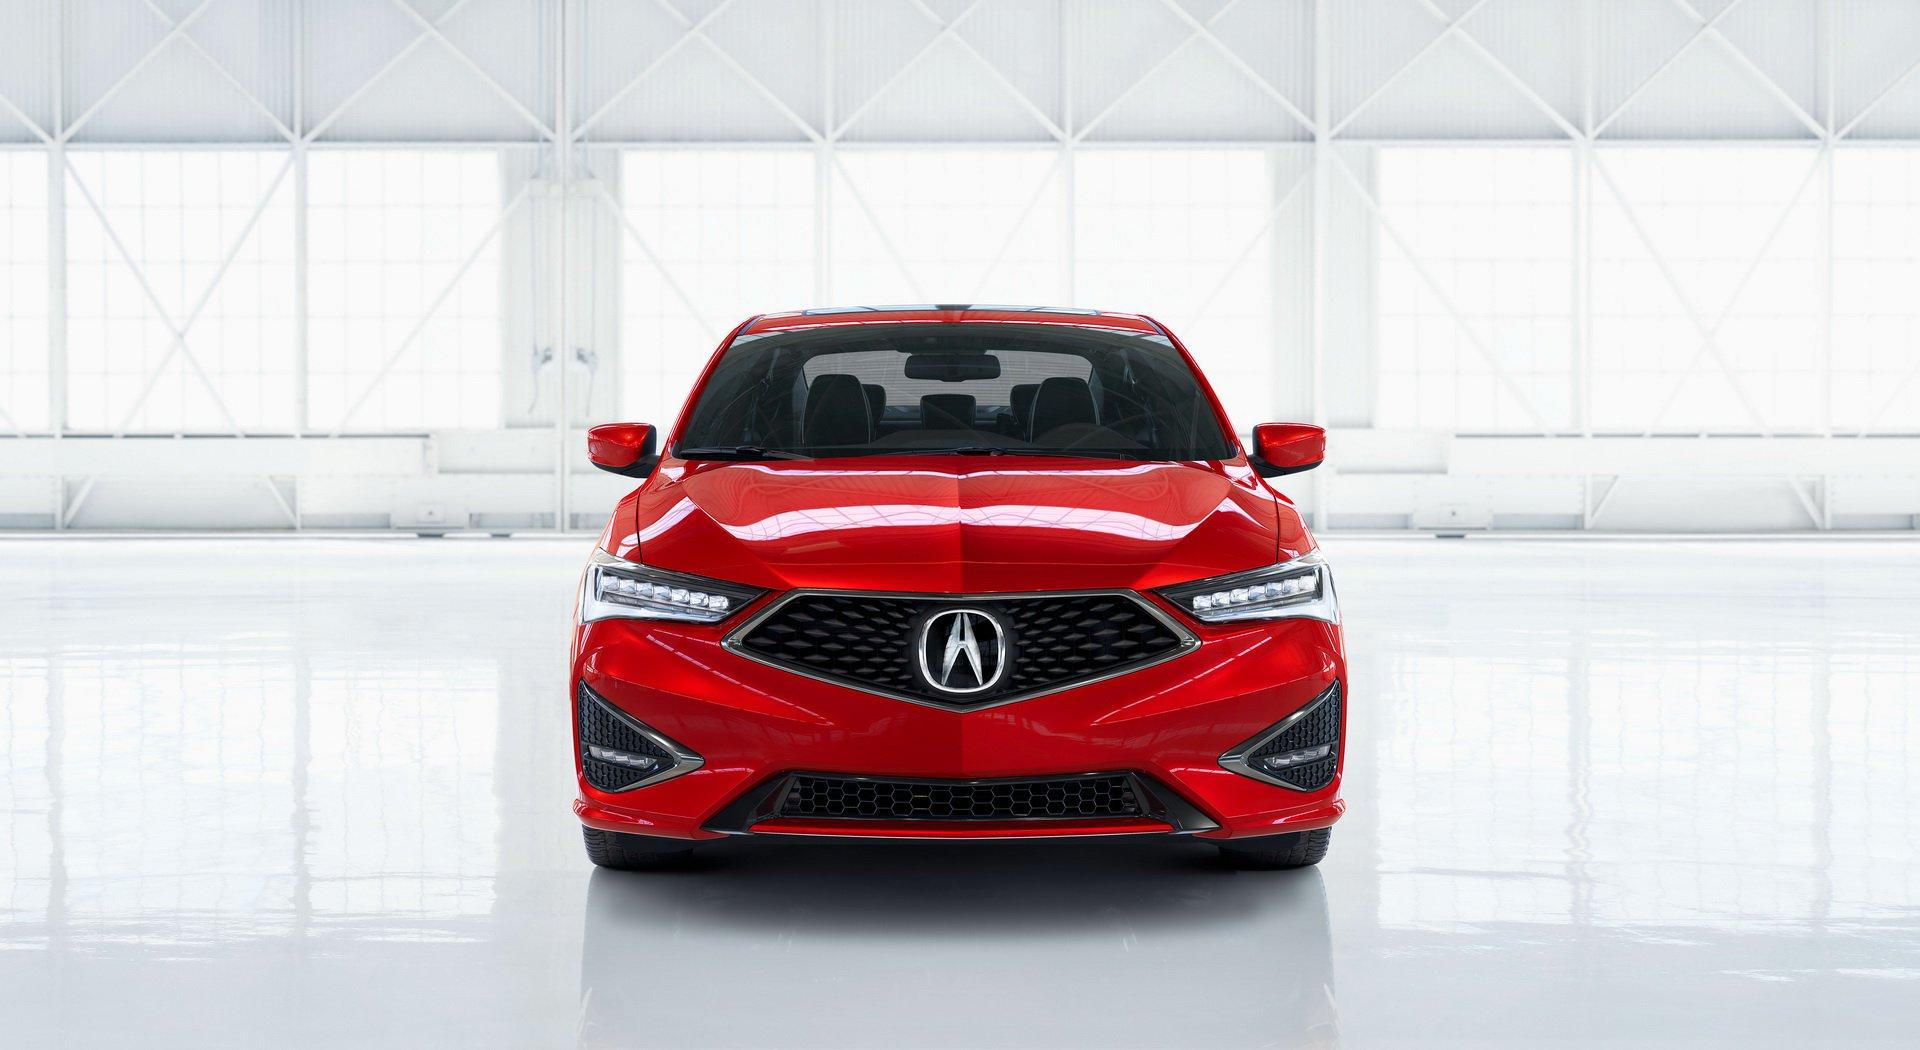 Acura ILX Loses Beak For 2019 Model Year